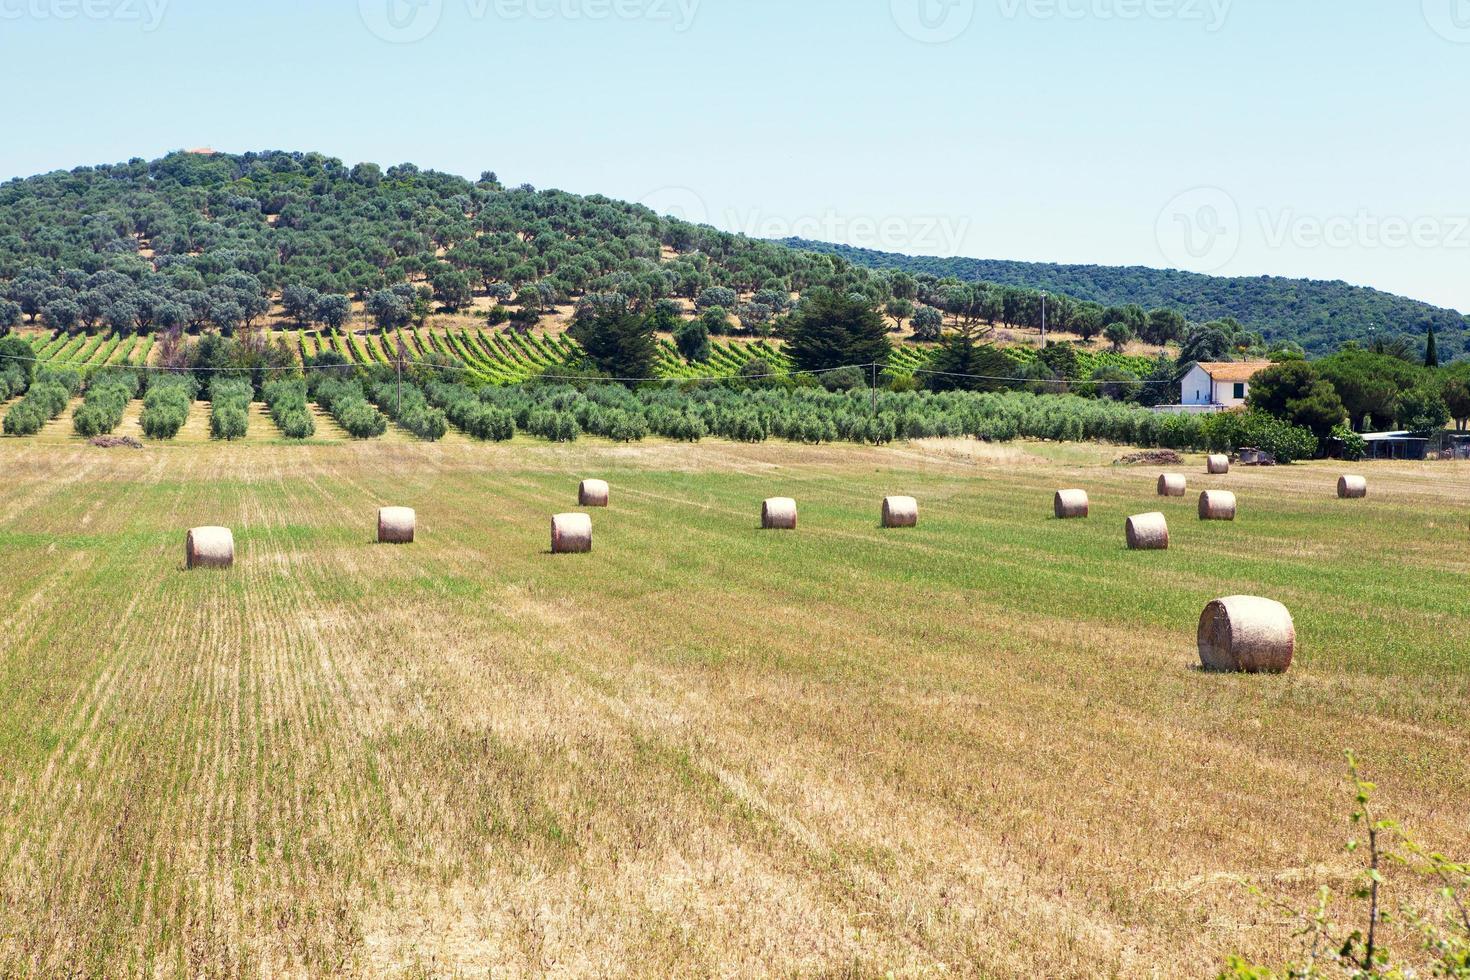 Tuscan village landscape photo